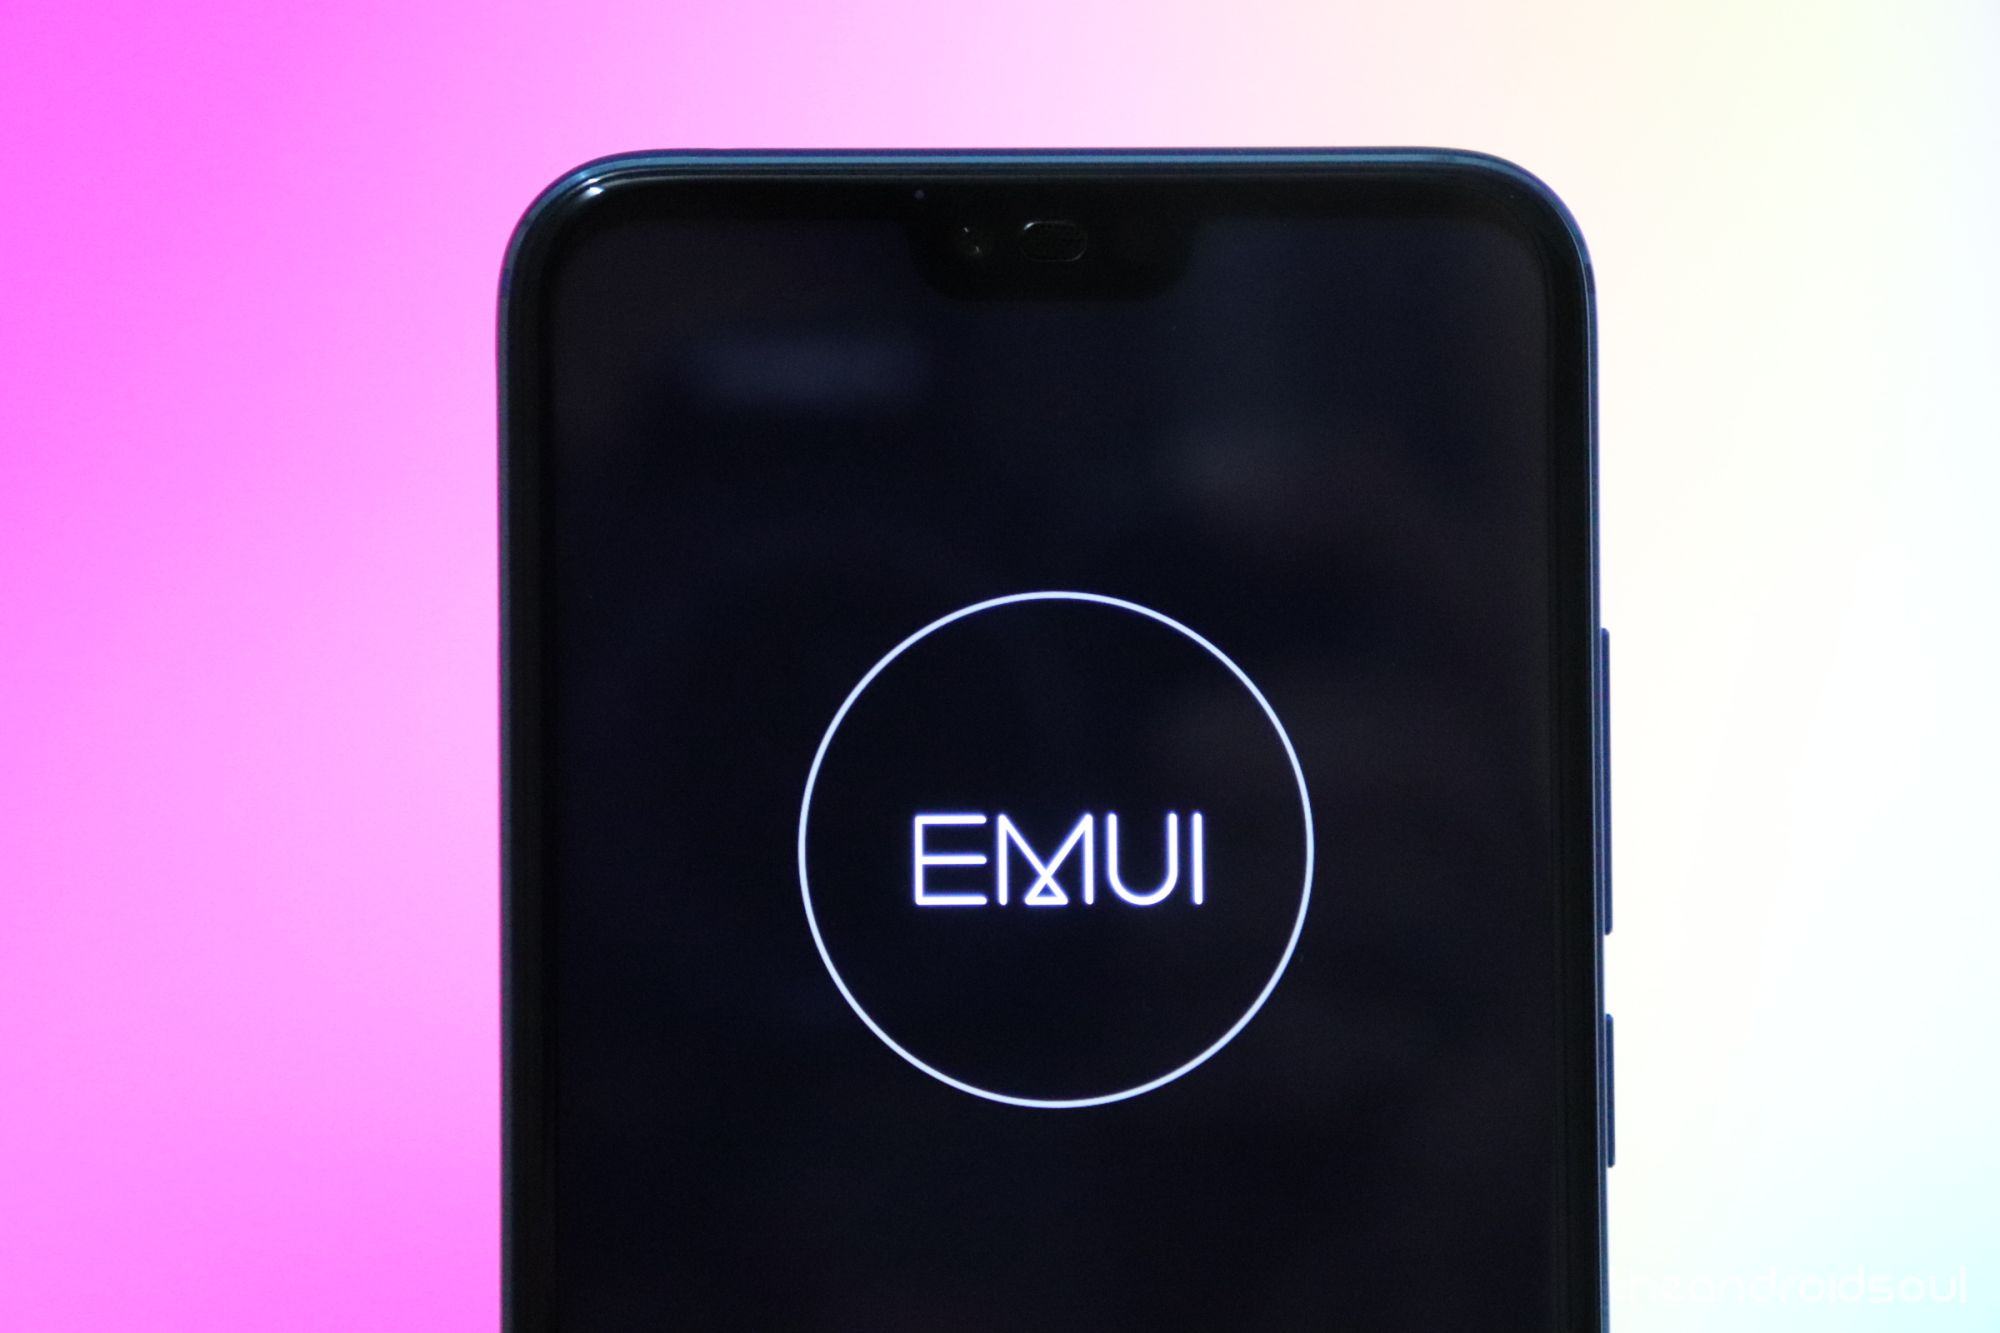 Honor-EMUI-8.1